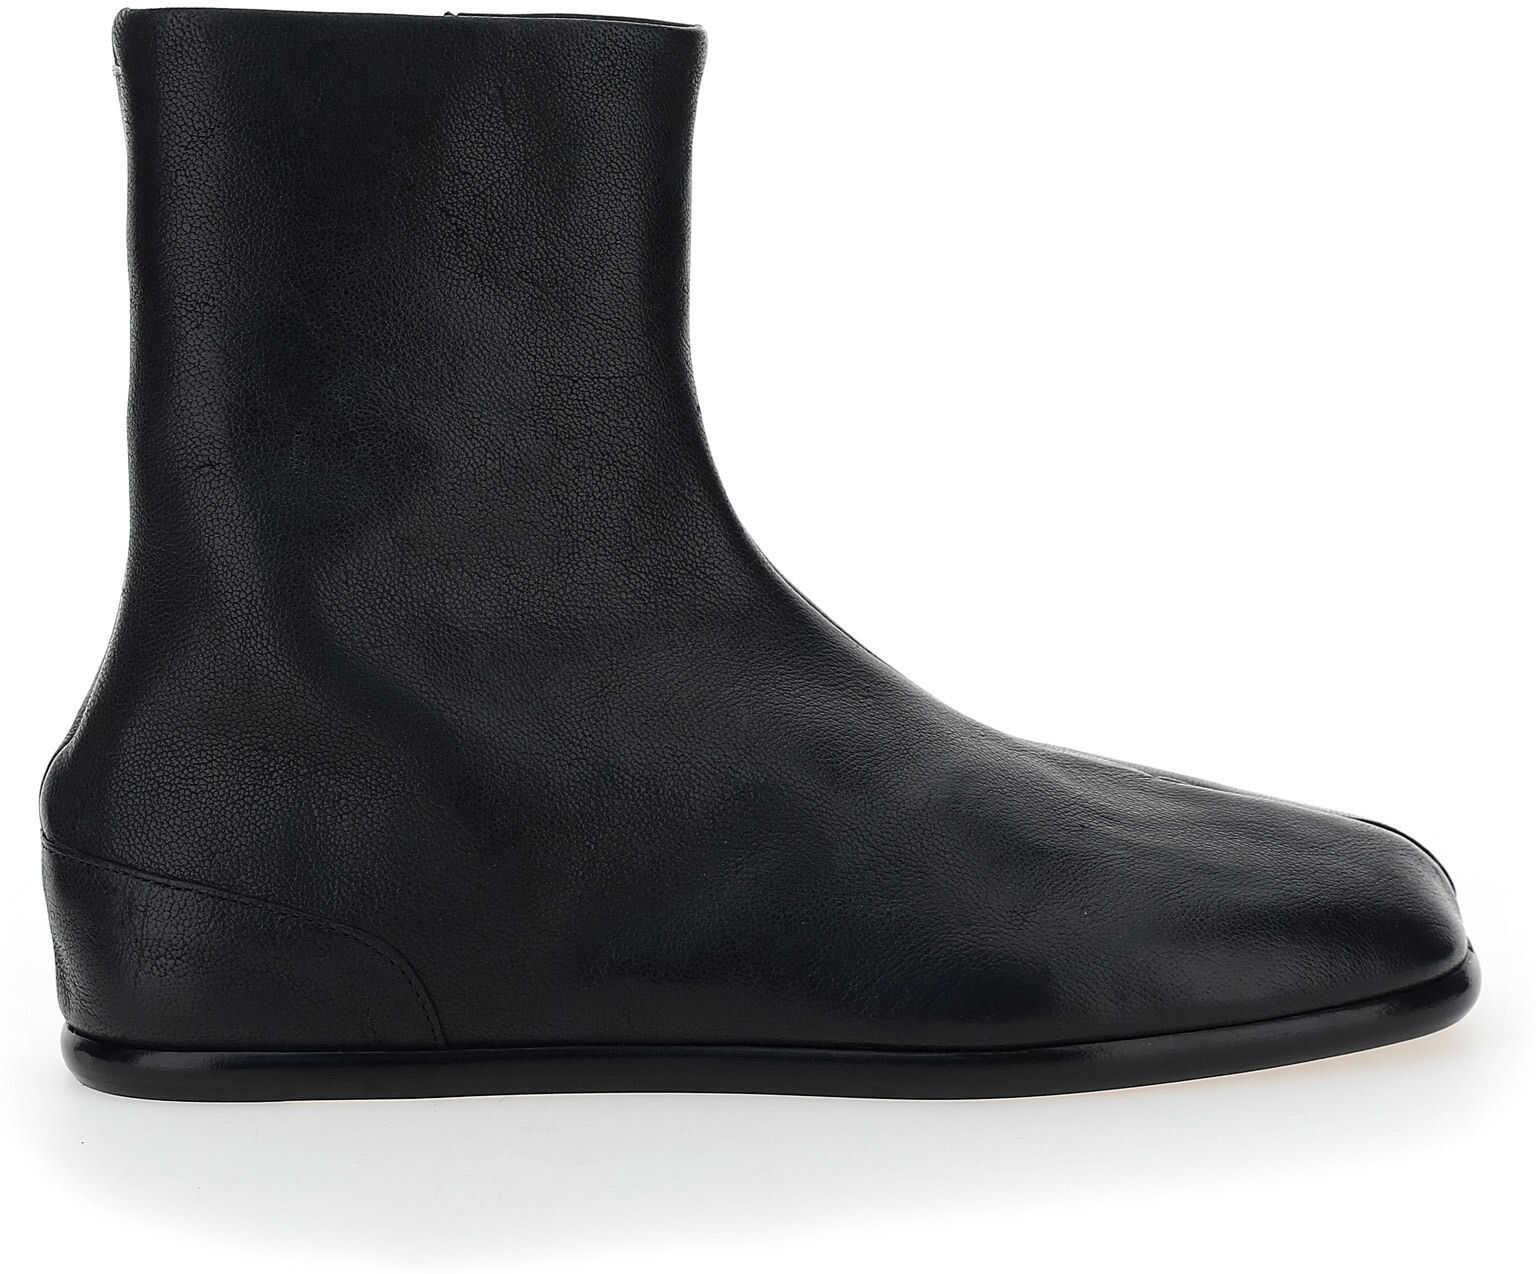 Maison Margiela Sneakers S57WU0222P3962 BLACK/ECRU imagine b-mall.ro